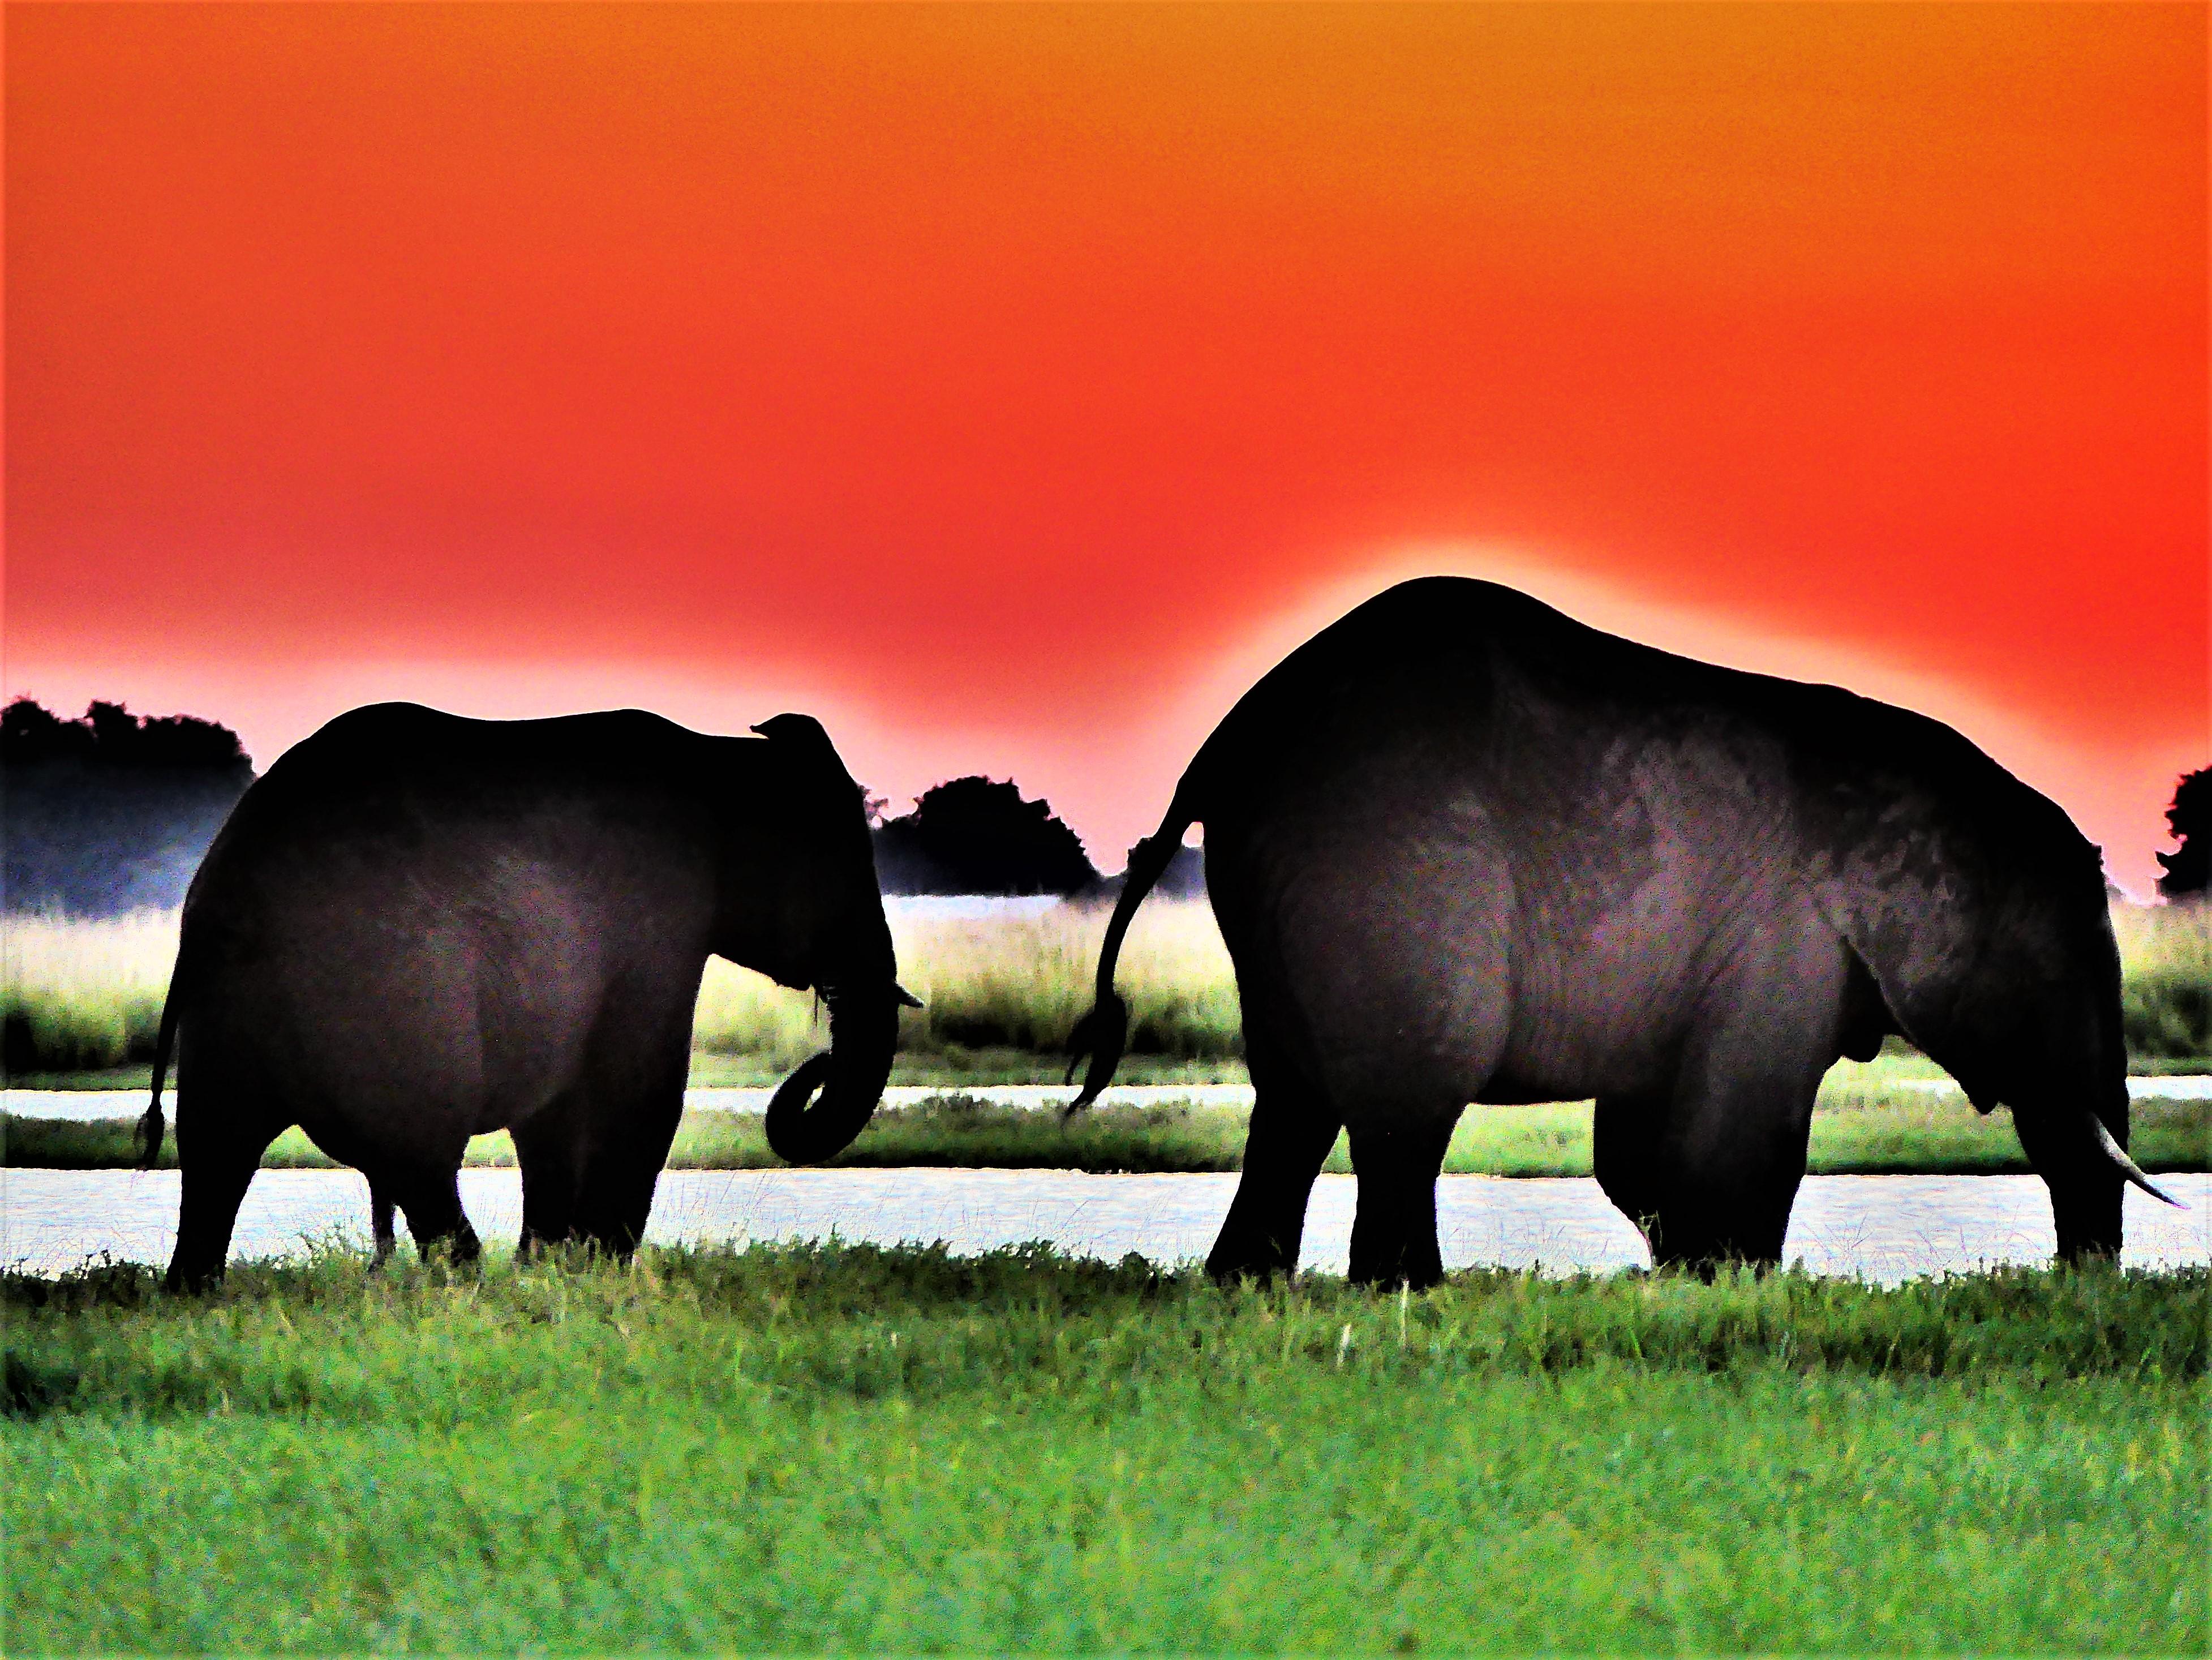 elephants under an orange sky